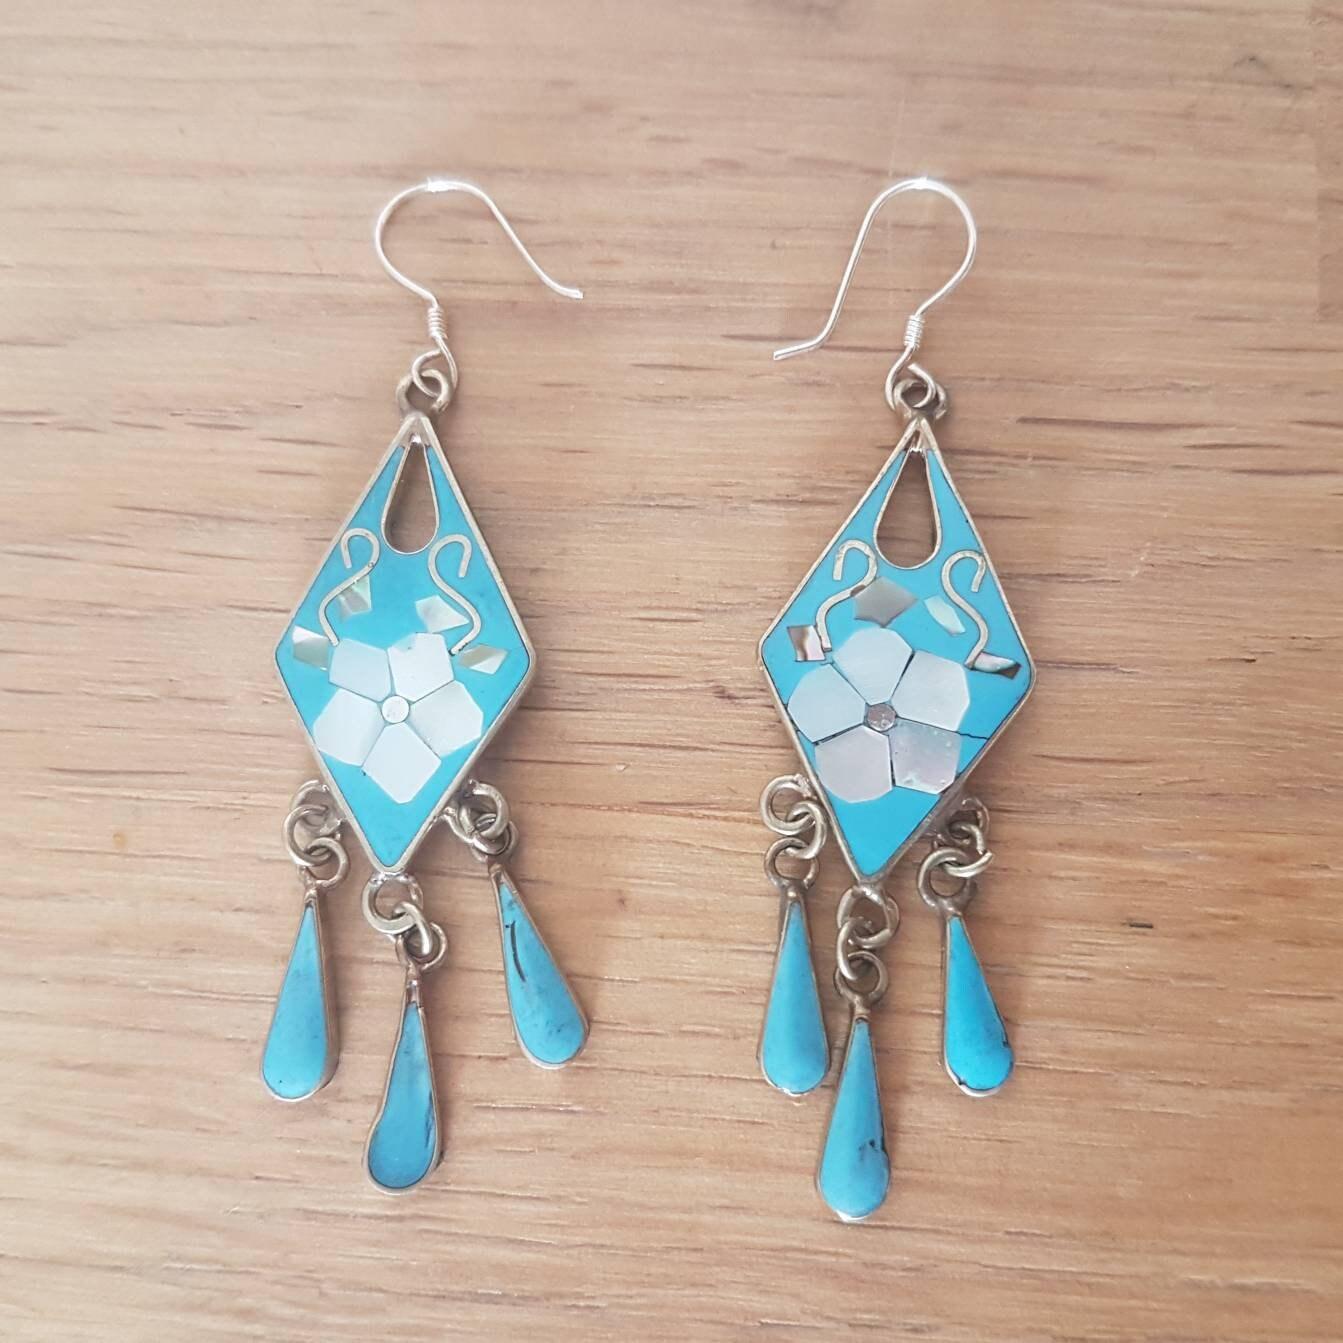 Mariposa Handmade Mexican earrings made of alpaca and abalone